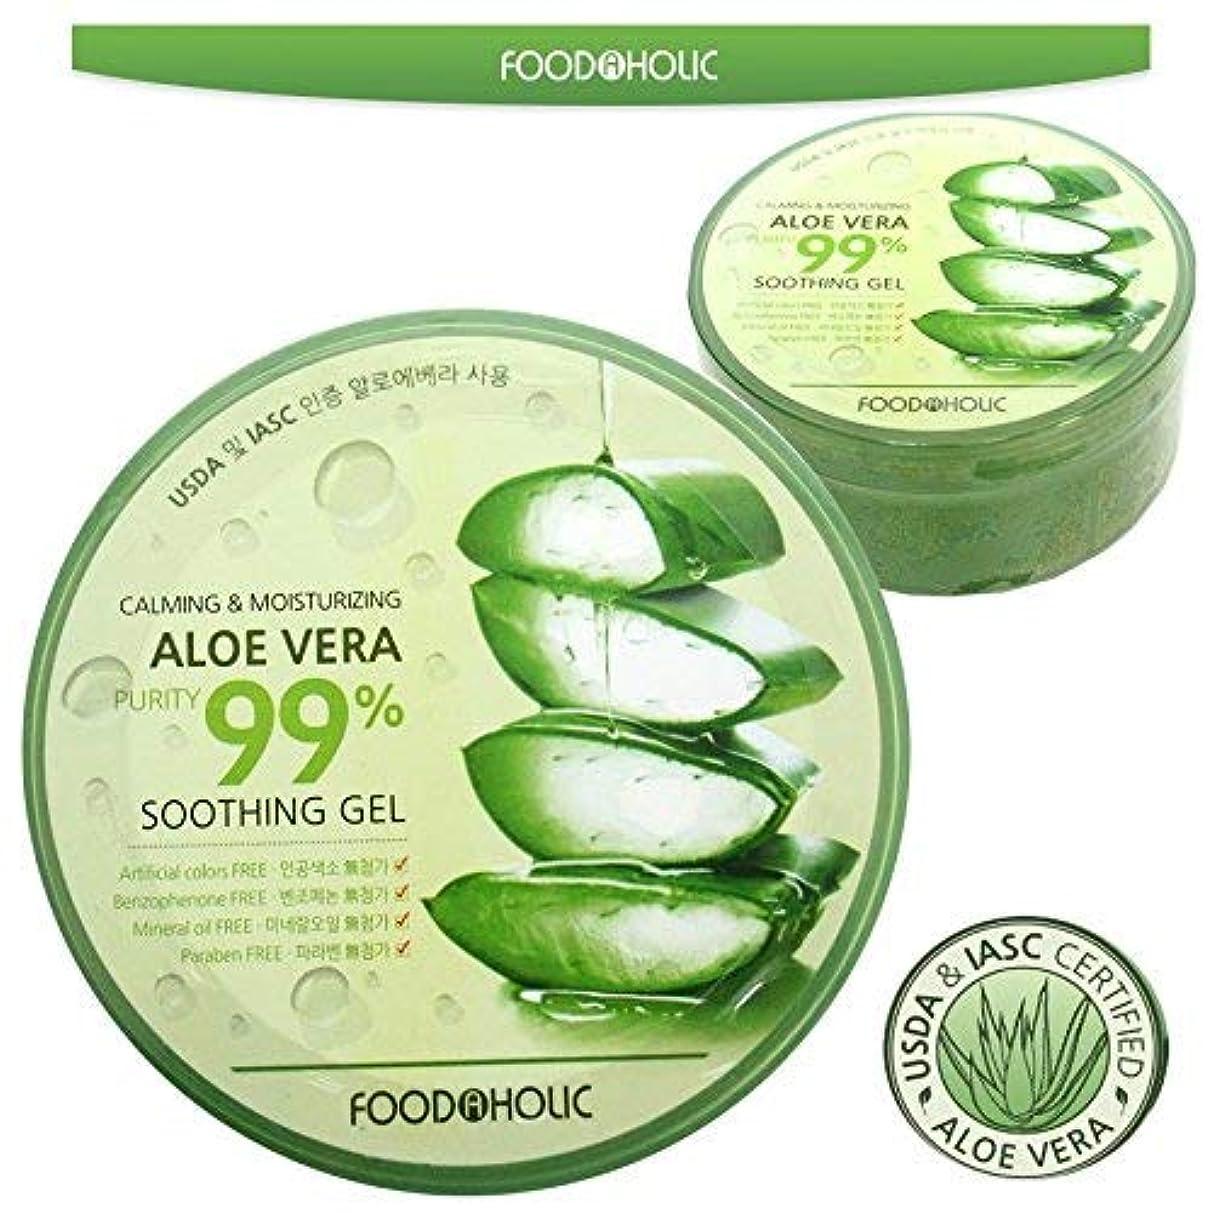 [FOOD A HOLIC] 穏やかな&保湿アロエベラ純度は99%スージングジェル(300ml * 1EA) / Calming & Moisturizing Aloe Vera Purity 99% Soothing...